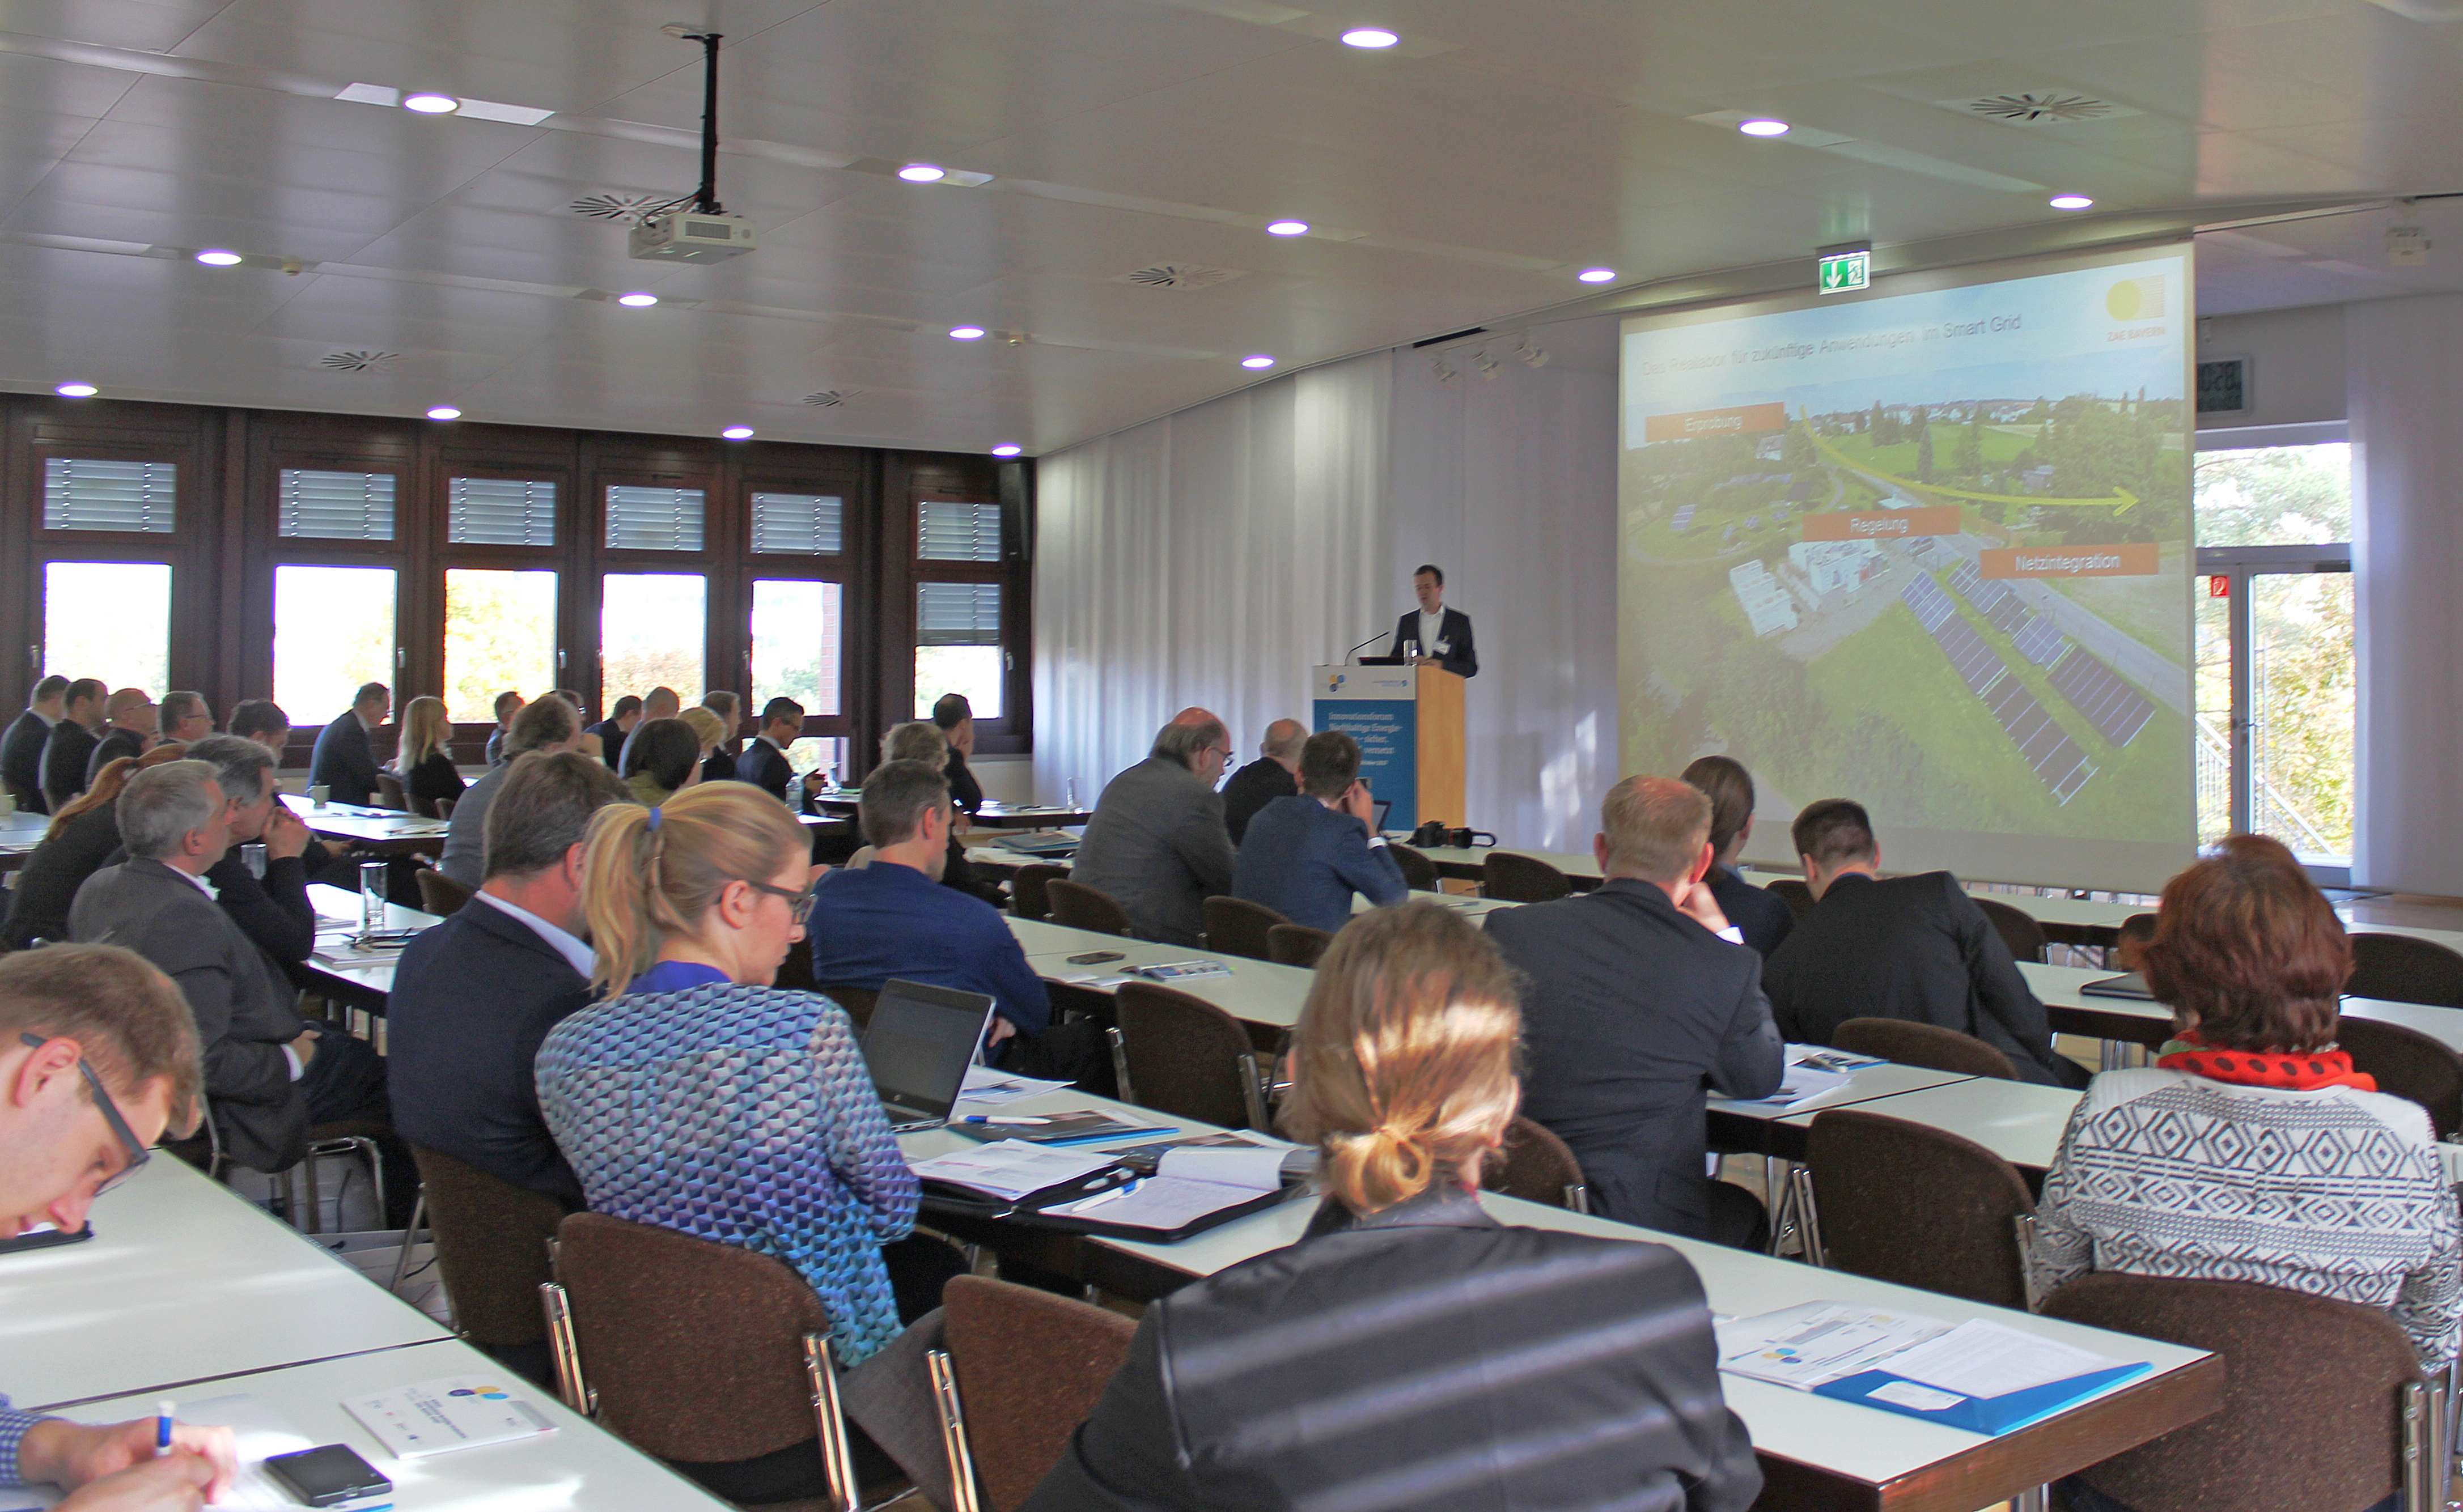 Nachhaltige Energiesysteme - Konferenz in Nürnberg